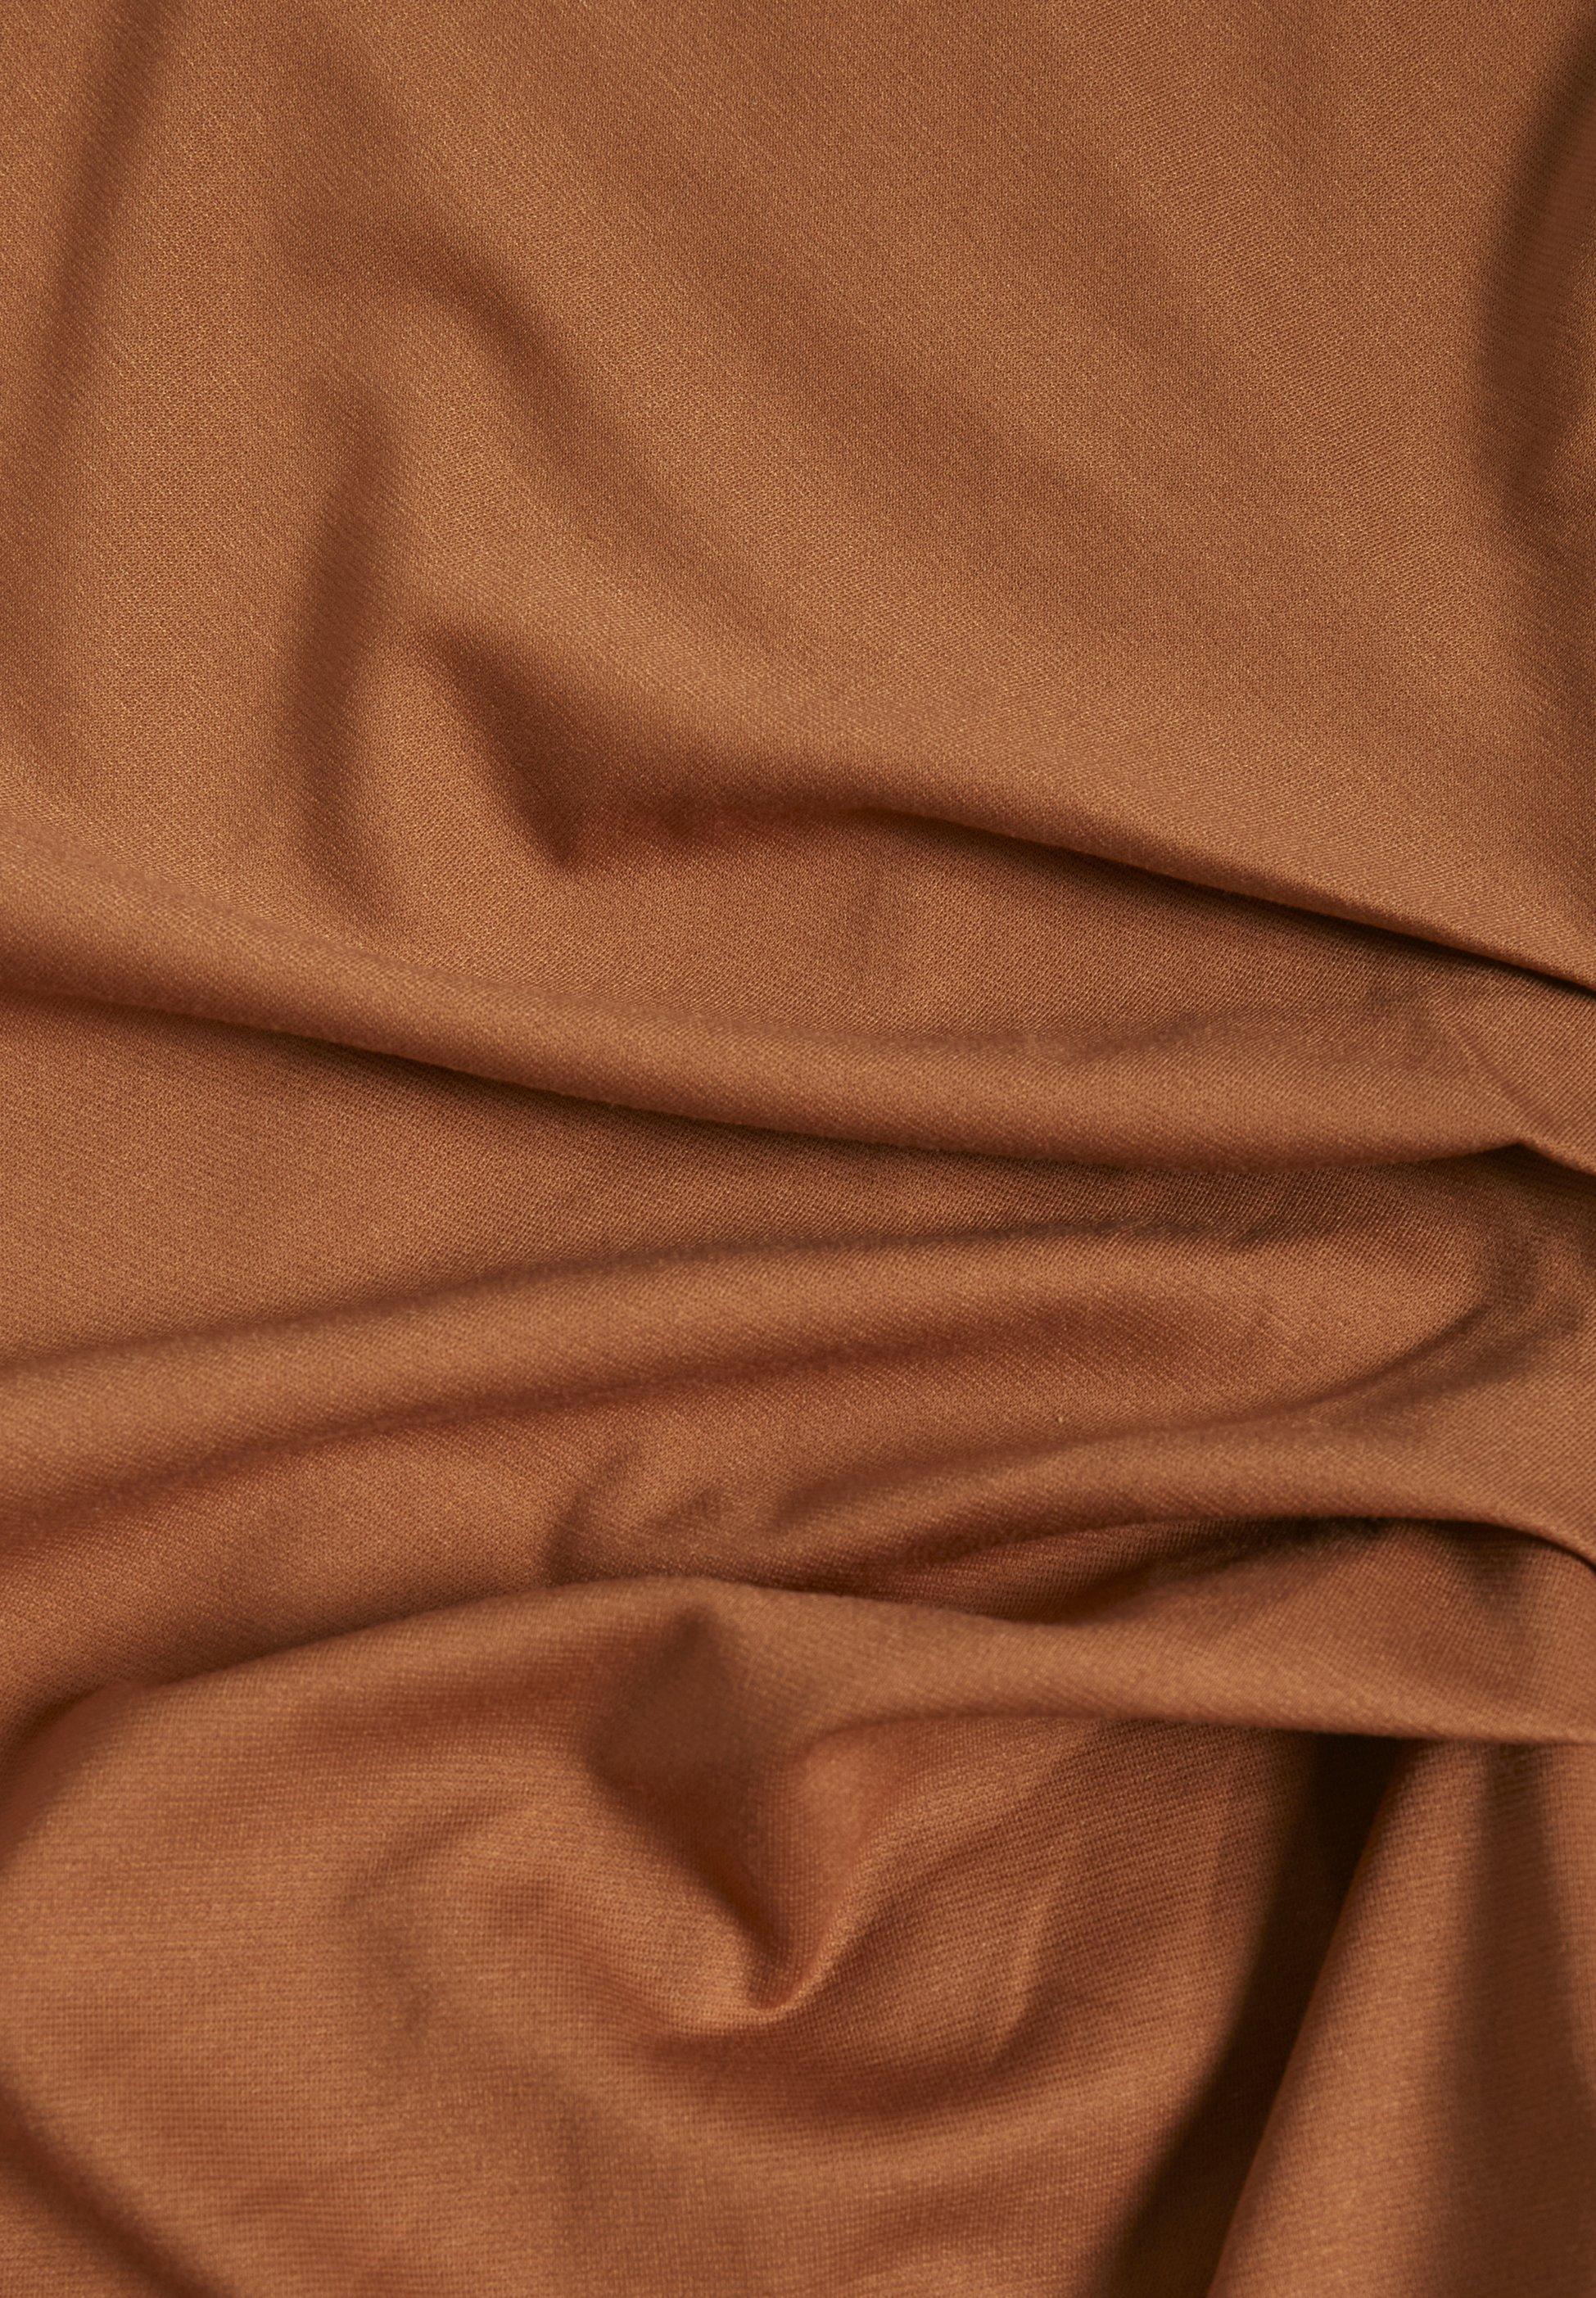 2020 New Up To Date Women's Clothing Kaffe INDIA V-NECK DRESS Shift dress sierra ijkKQ6REH W9UUVUjKK